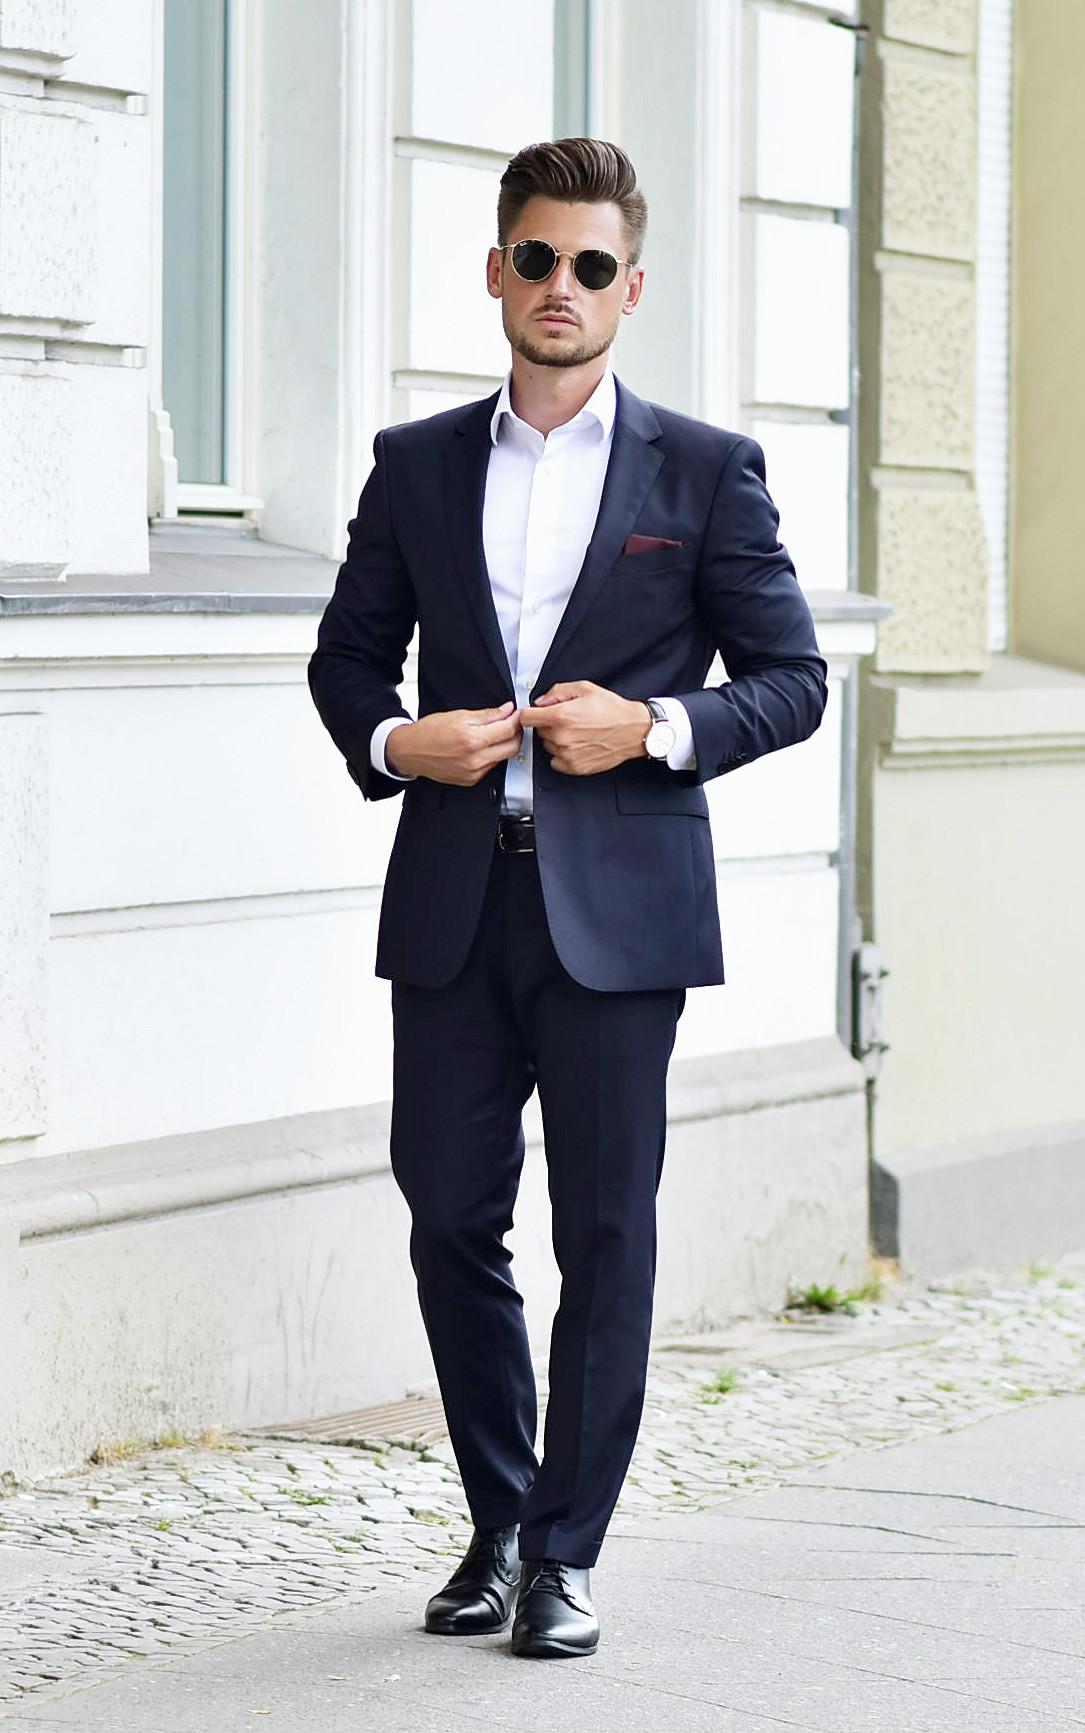 Tommeezjerry-Styleblog-Männerblog-Männer-Modeblog-Berlin-Berlinblog-Männermodeblog-Outfit-Classy-Chic-Suit-Anzug-Hugo-Boss-Nationalmannschaft-Deutschland-Marineblau-Suit-Up